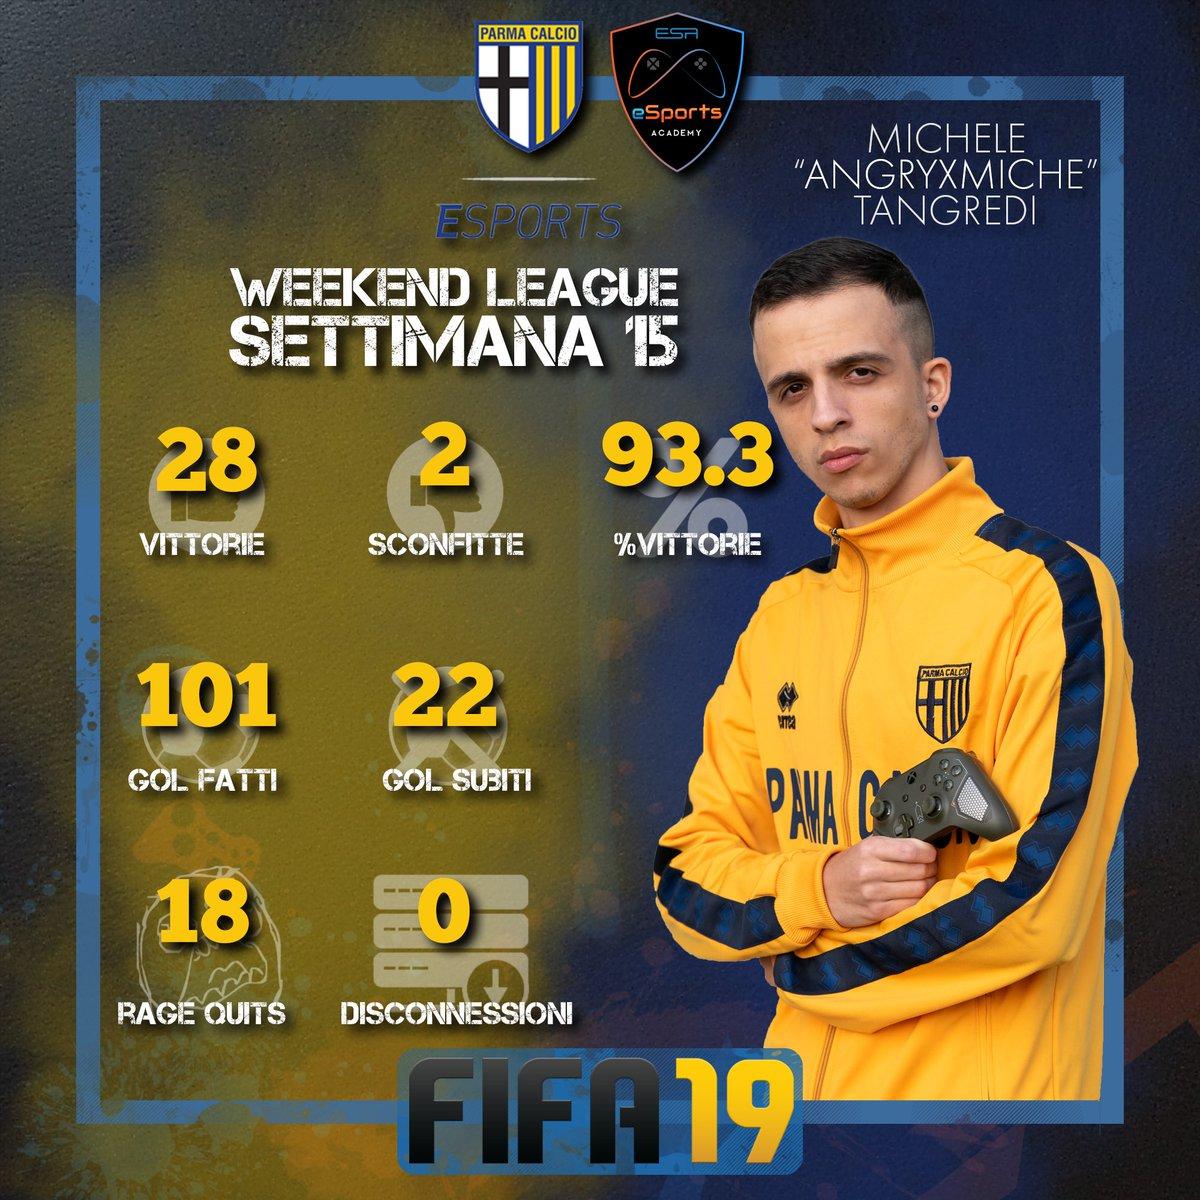 #weekendleague 15 results @Miche_Tangredi @gintera96 @1913parmacalcio